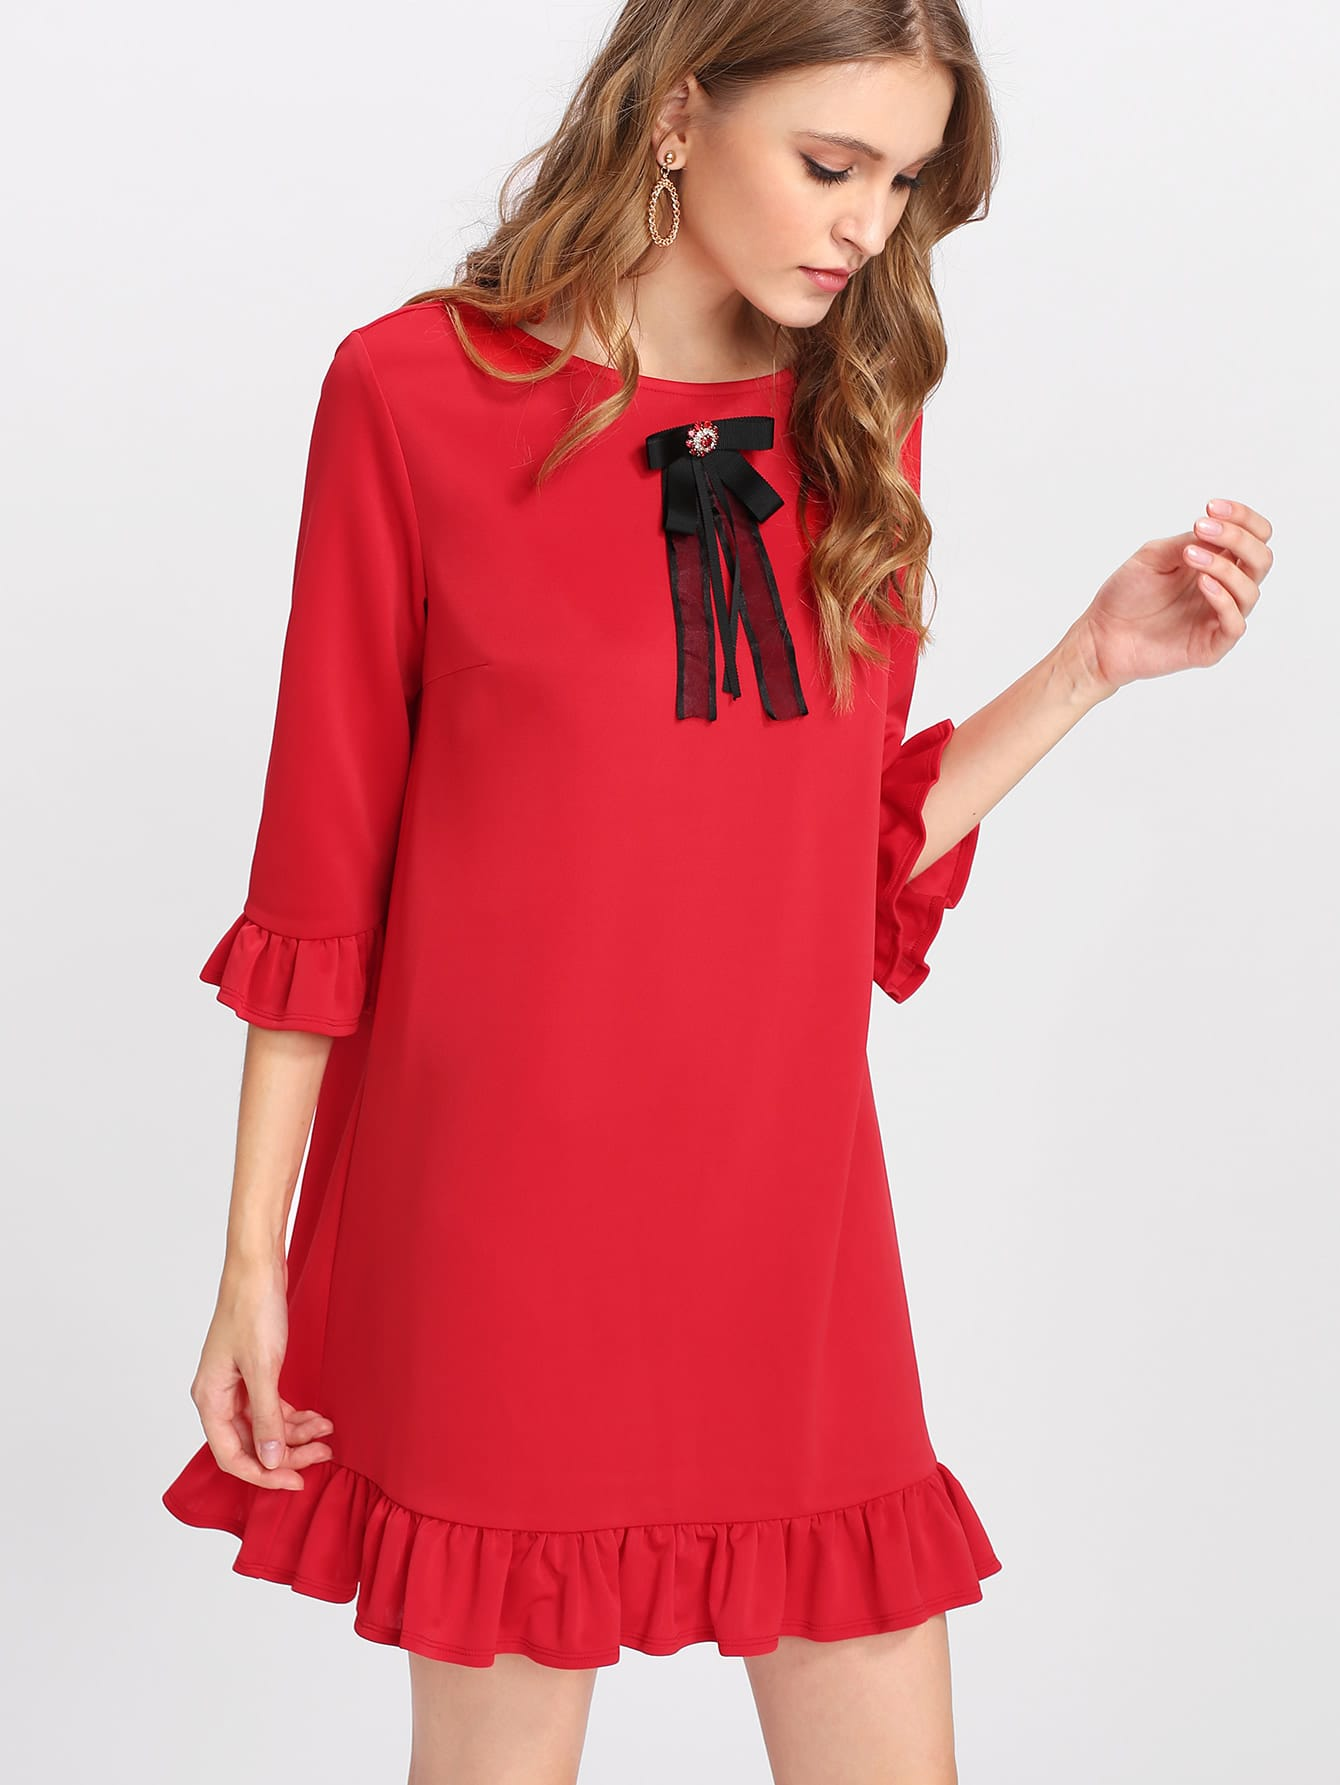 Rhinestone And Bow Embellished Ruffle Trim Dress dress171115707